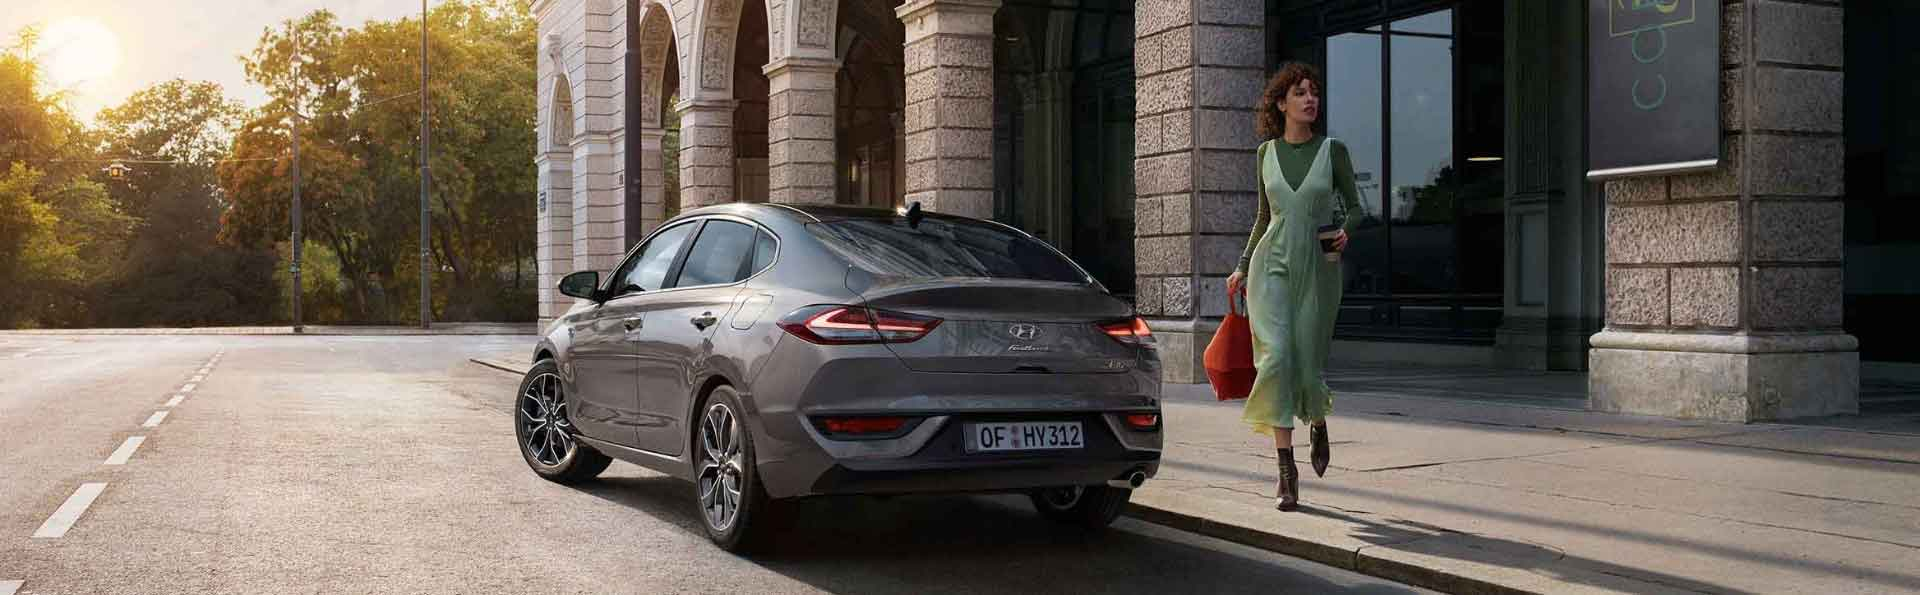 Hyundai Auto Abo; Leasing; Österreich